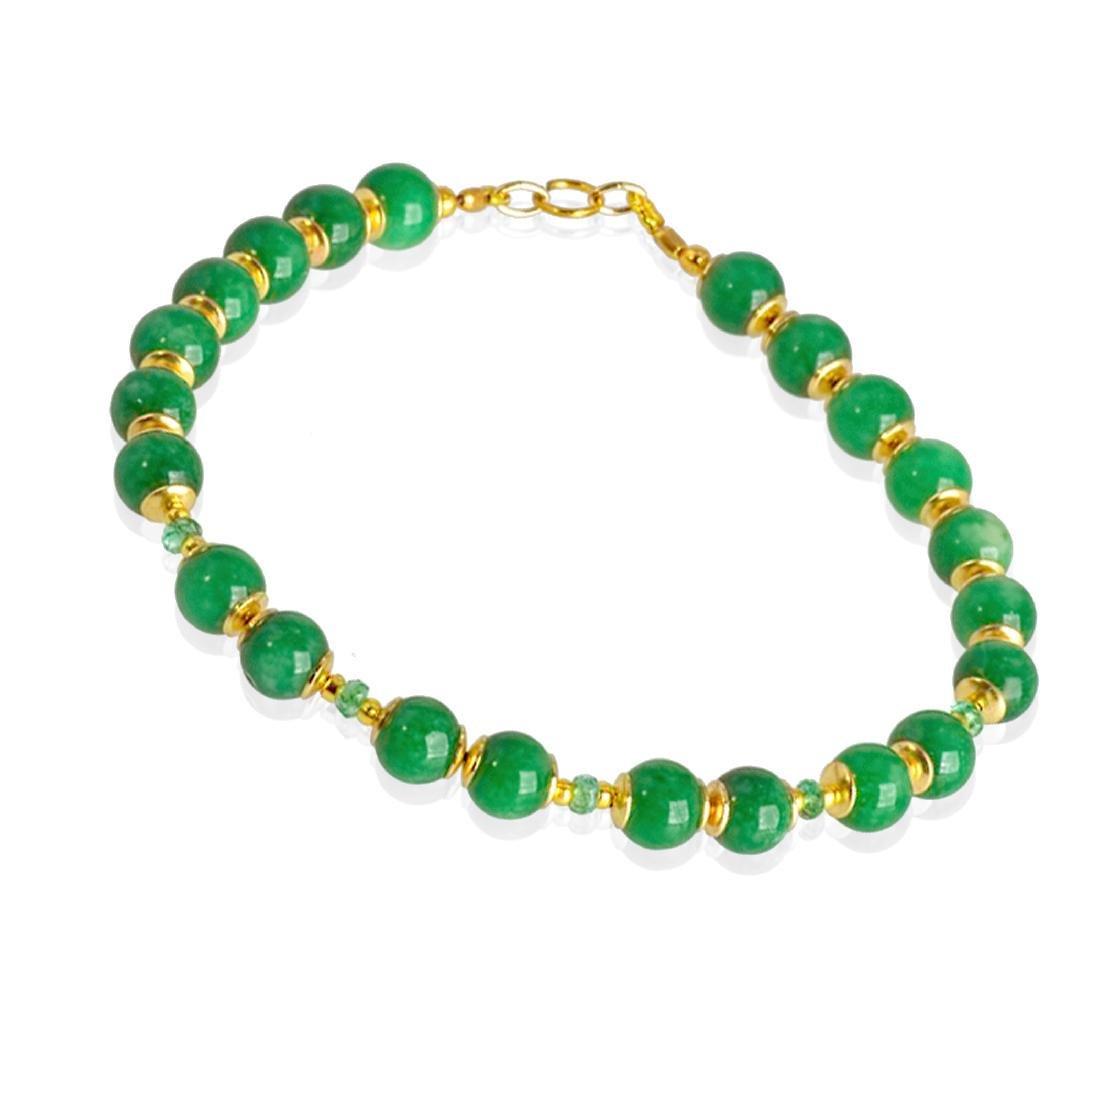 14K Gold Imperial Emerald Green Jade Bracelet - 4